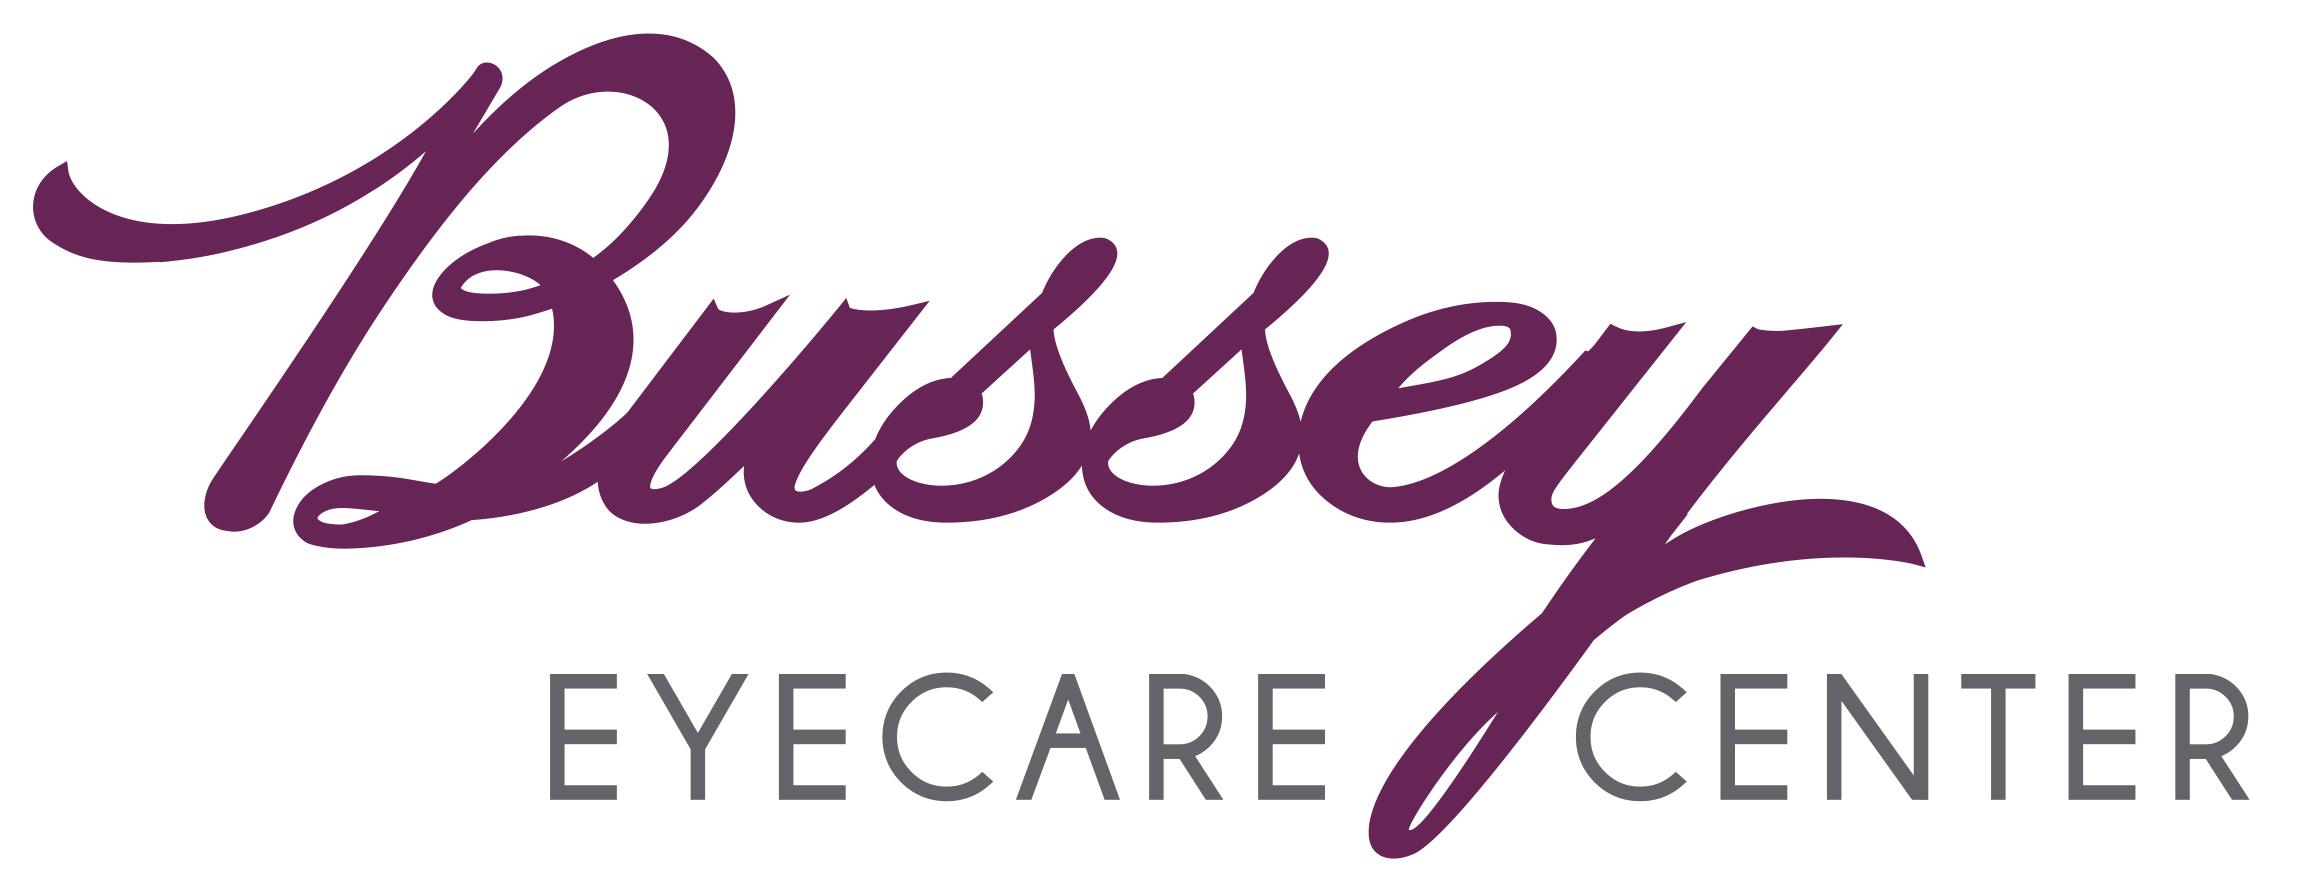 Bussey Eyecare Center Logo